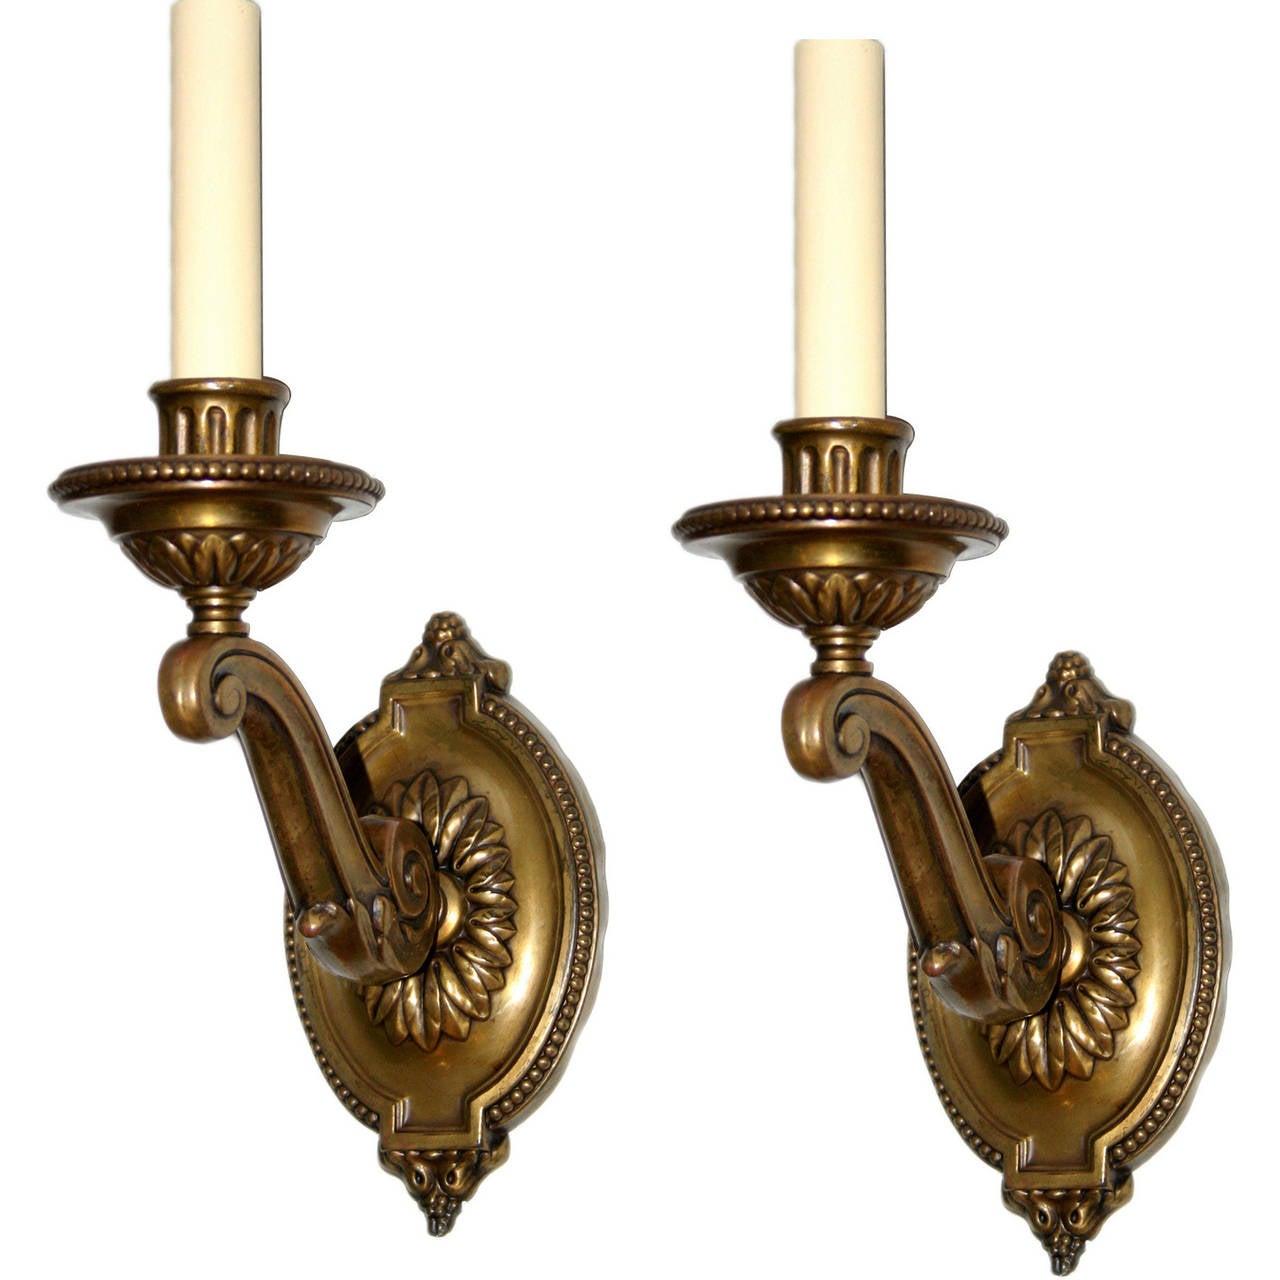 Neoclassic Single Light Sconces